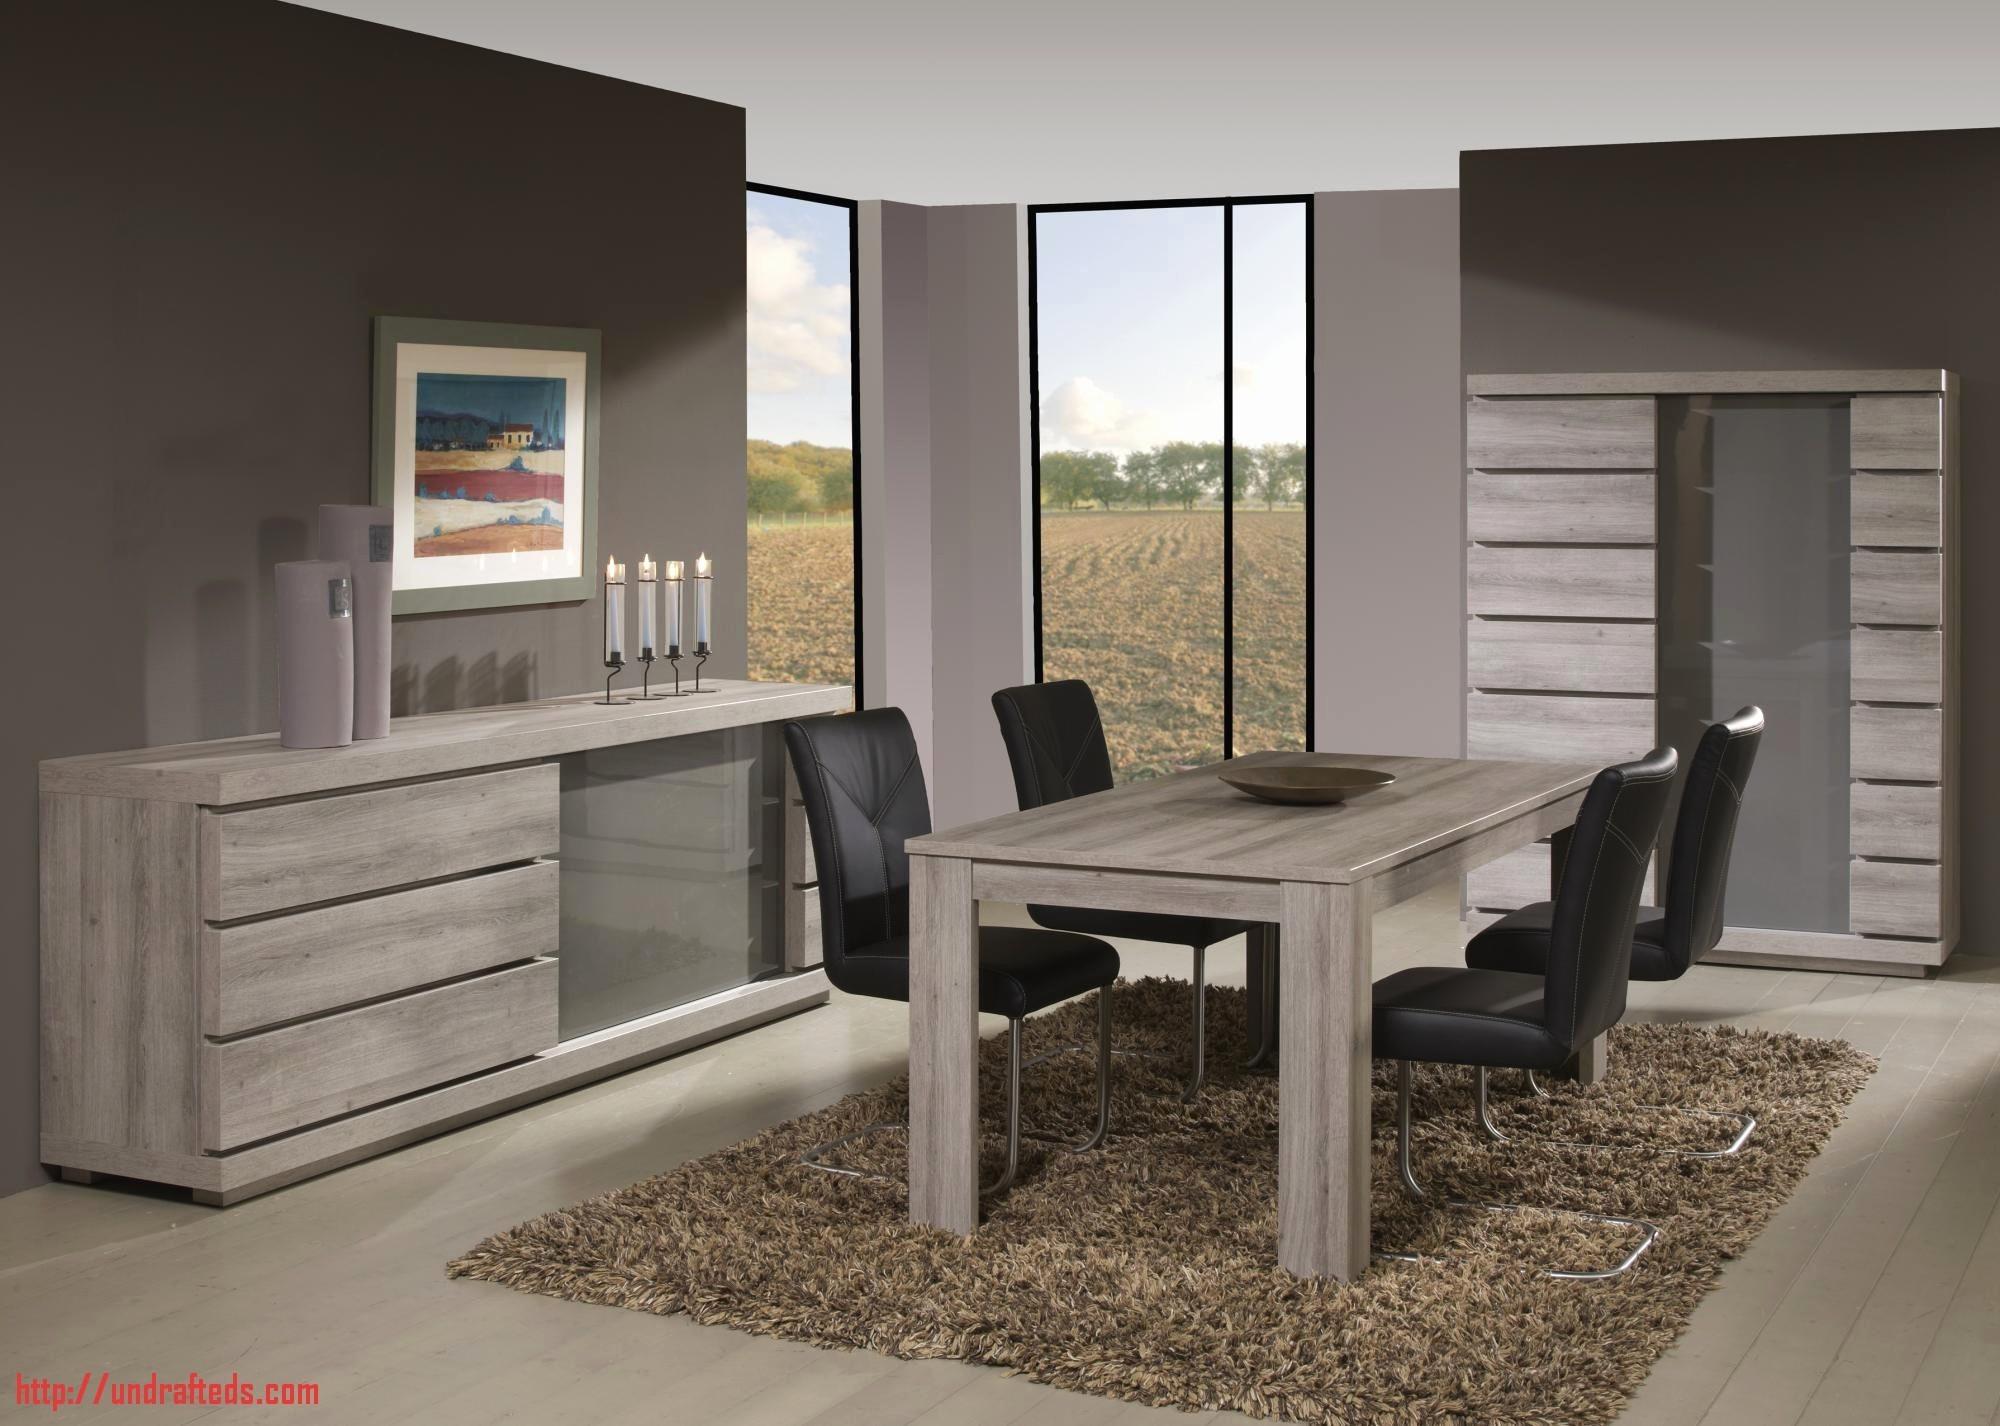 polynucl aires osinophiles en hausse. Black Bedroom Furniture Sets. Home Design Ideas